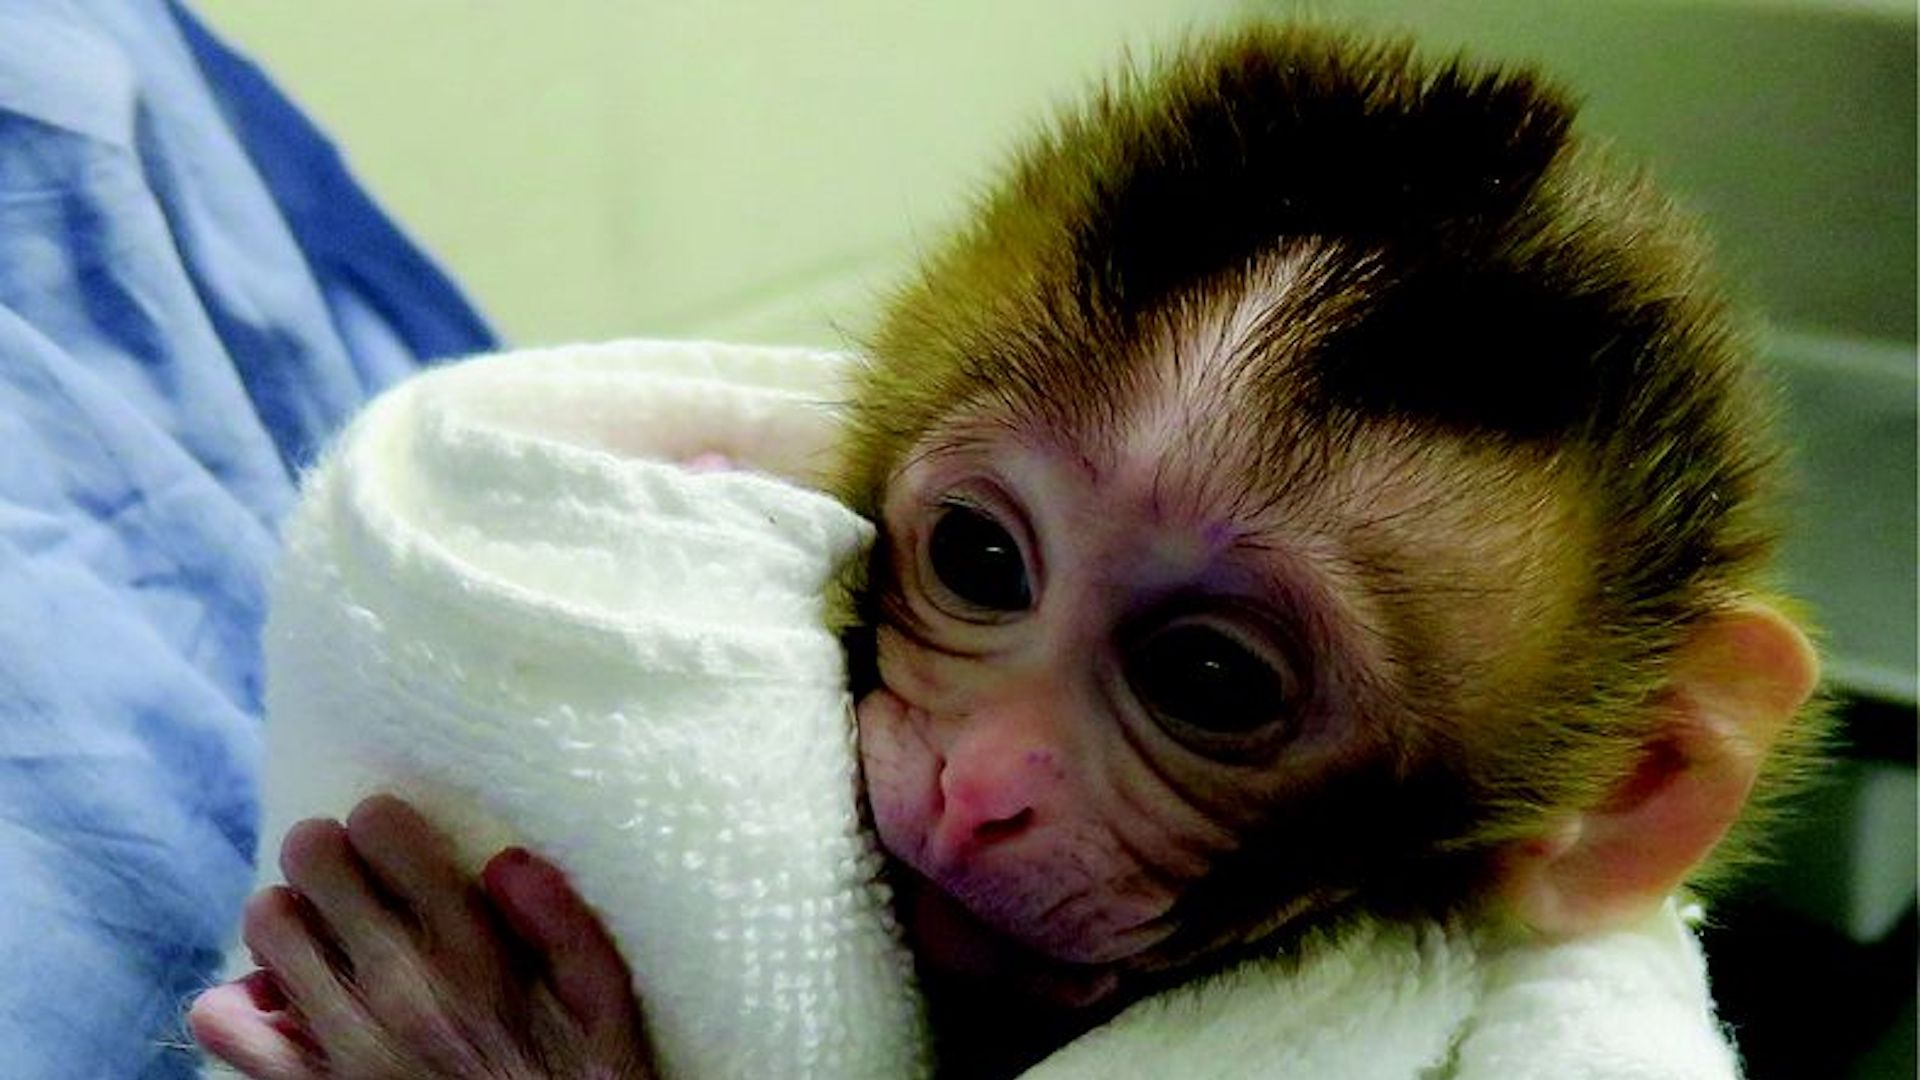 12-week-old Grady, born from cryopreserved testicular tissue.